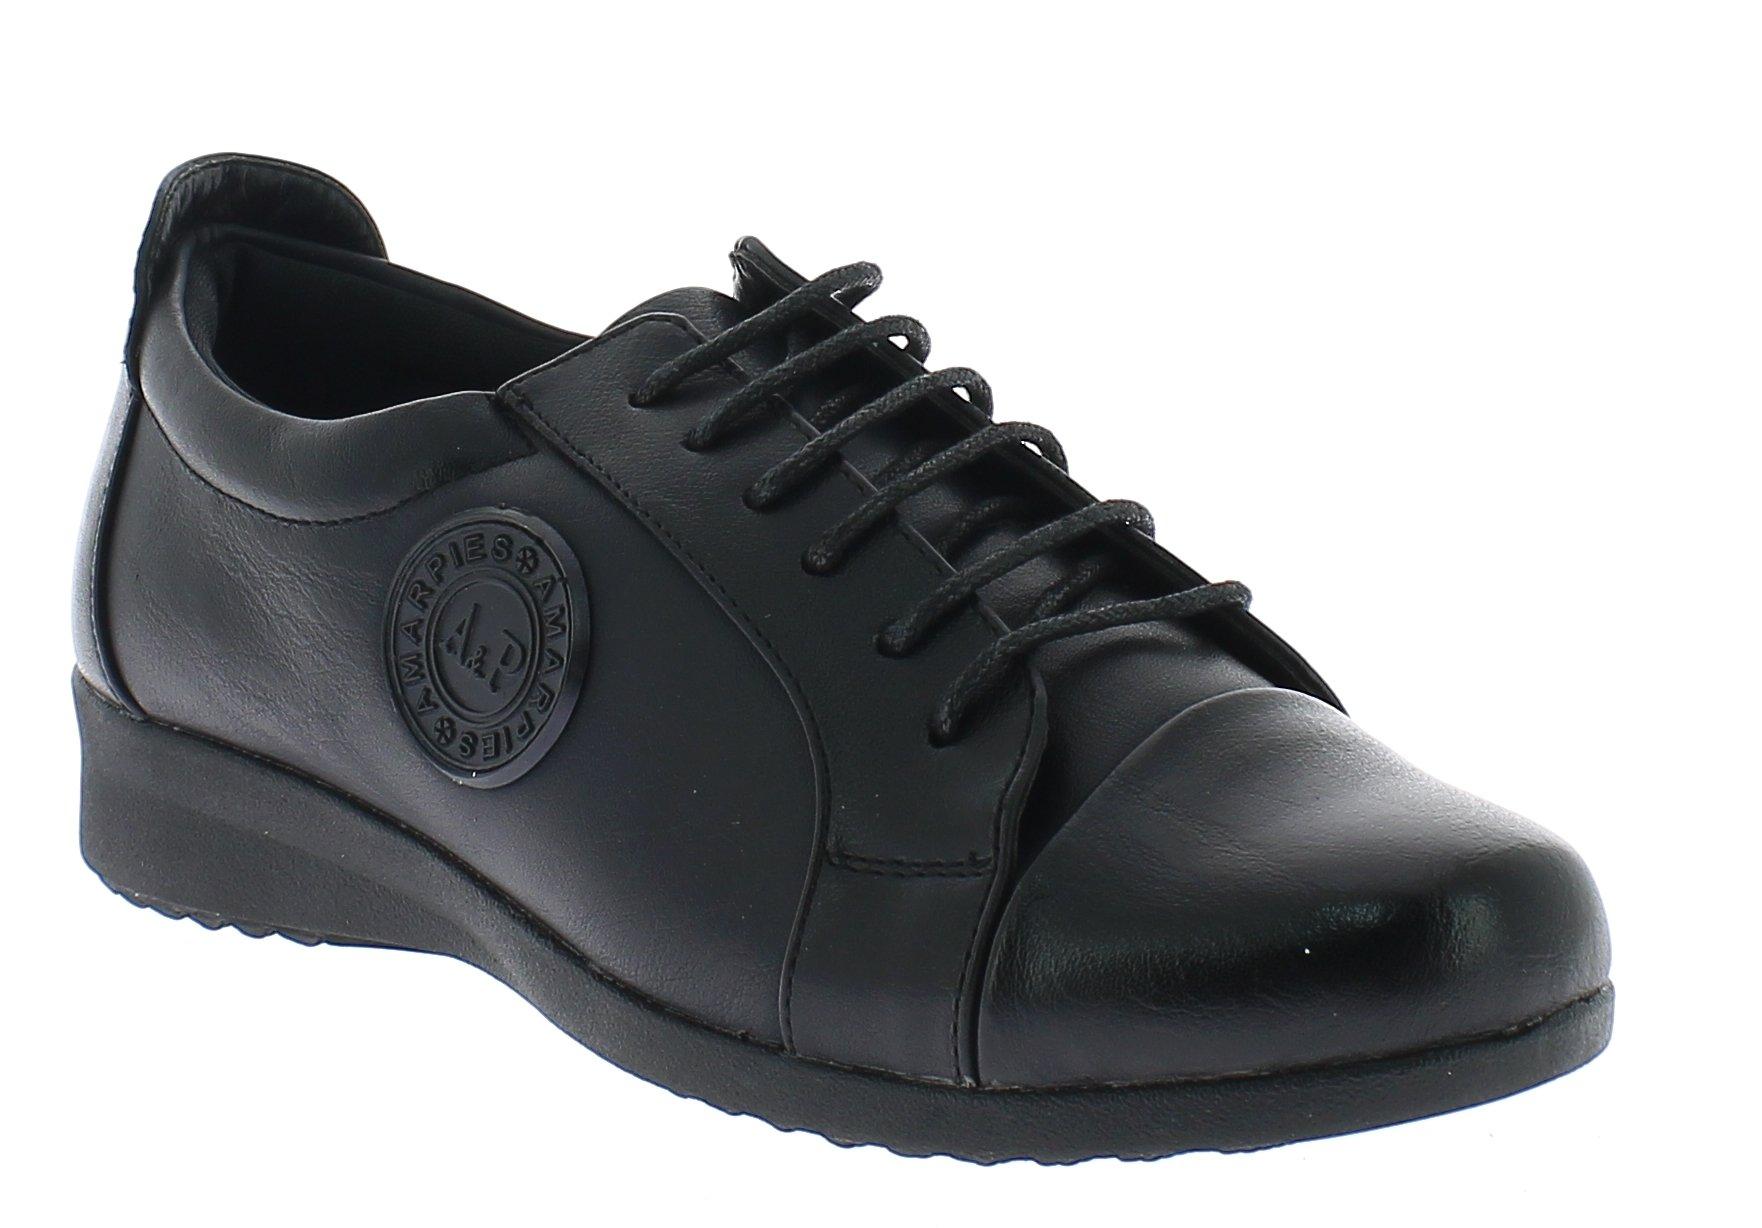 AMARPIES Γυναικεία Comfort AKT9808 Μαύρο - IqShoes - AKT9808 BLACK-black-35/1/15 προϊόντα παπούτσια